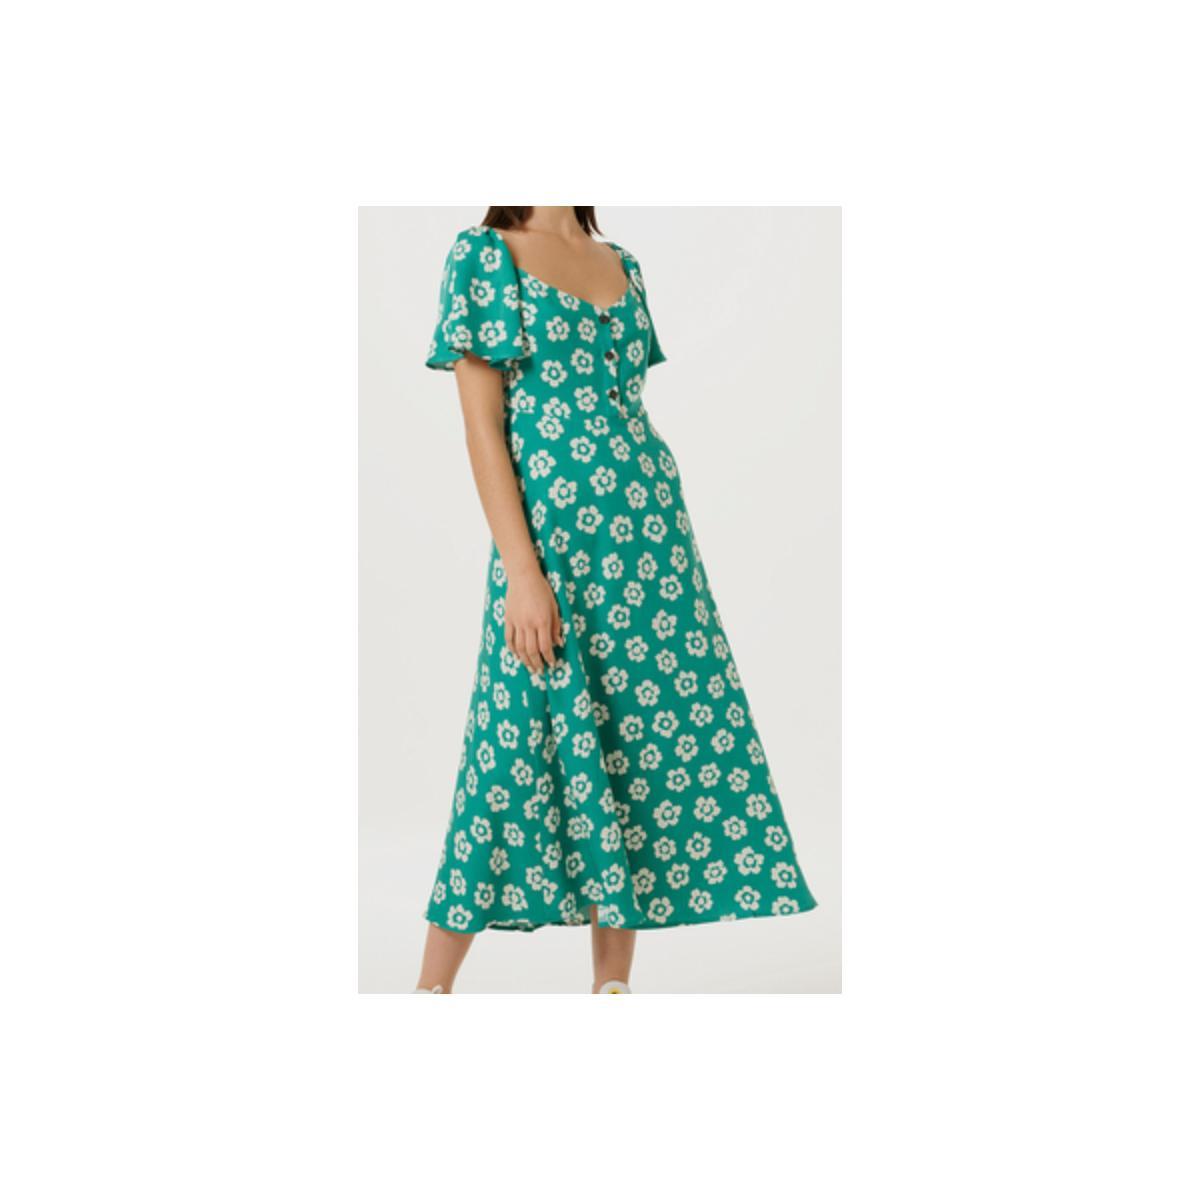 Vestido Feminino Hering Ha6h 1cen Verde